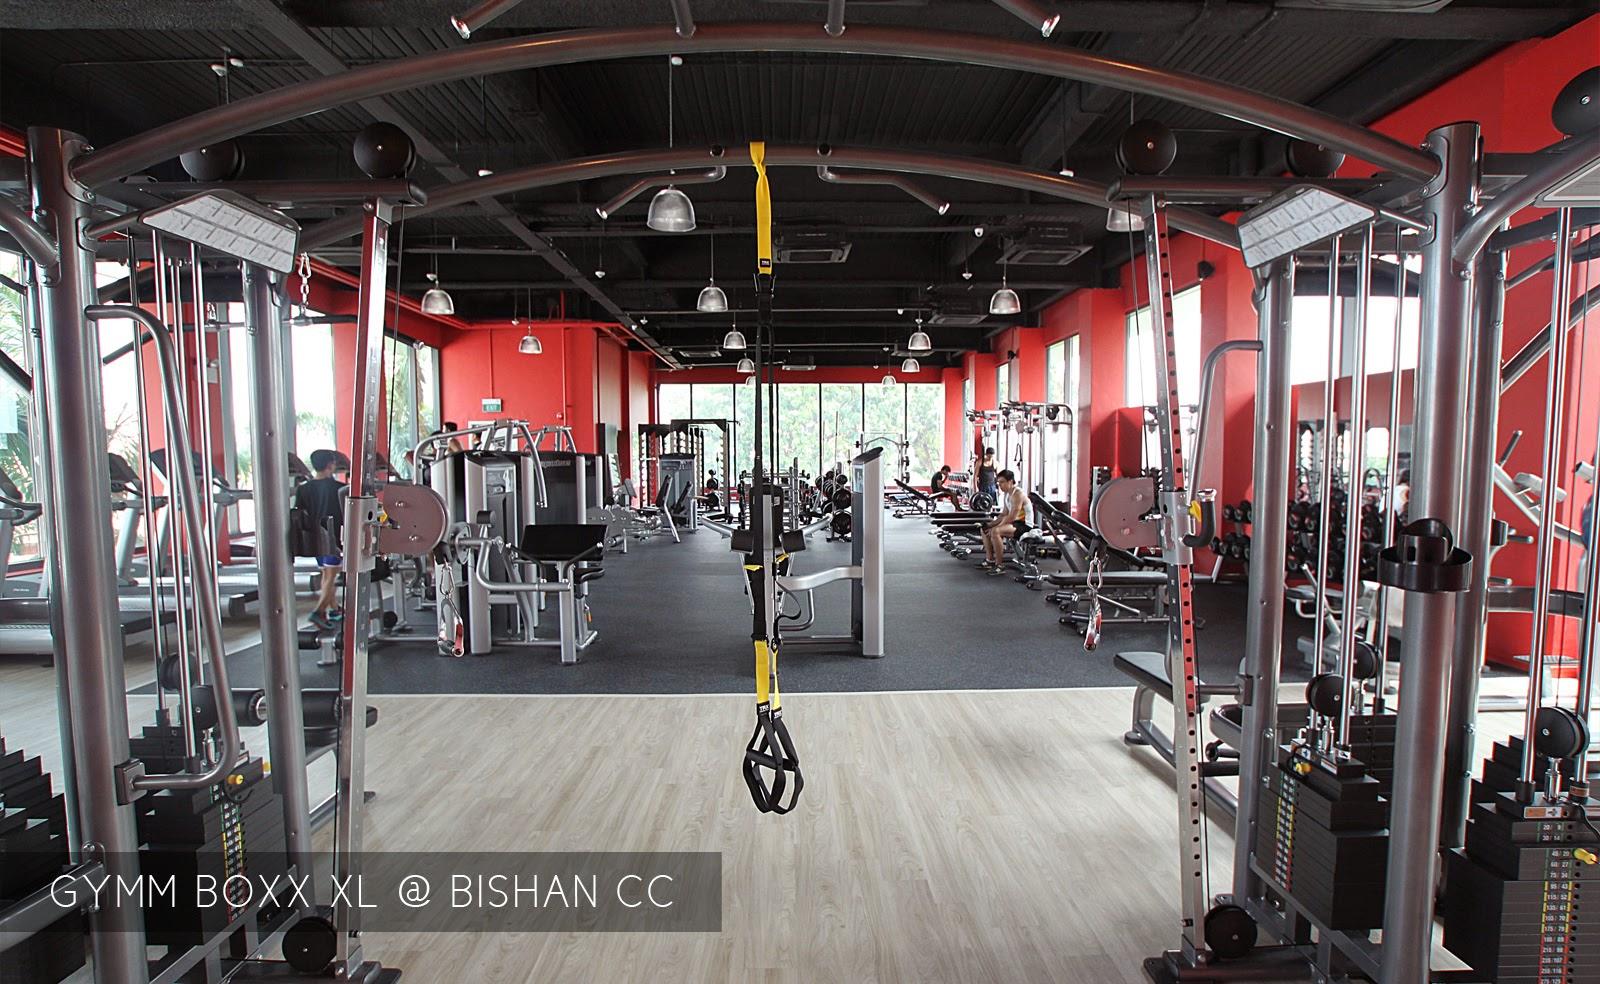 gymm boxx bishan